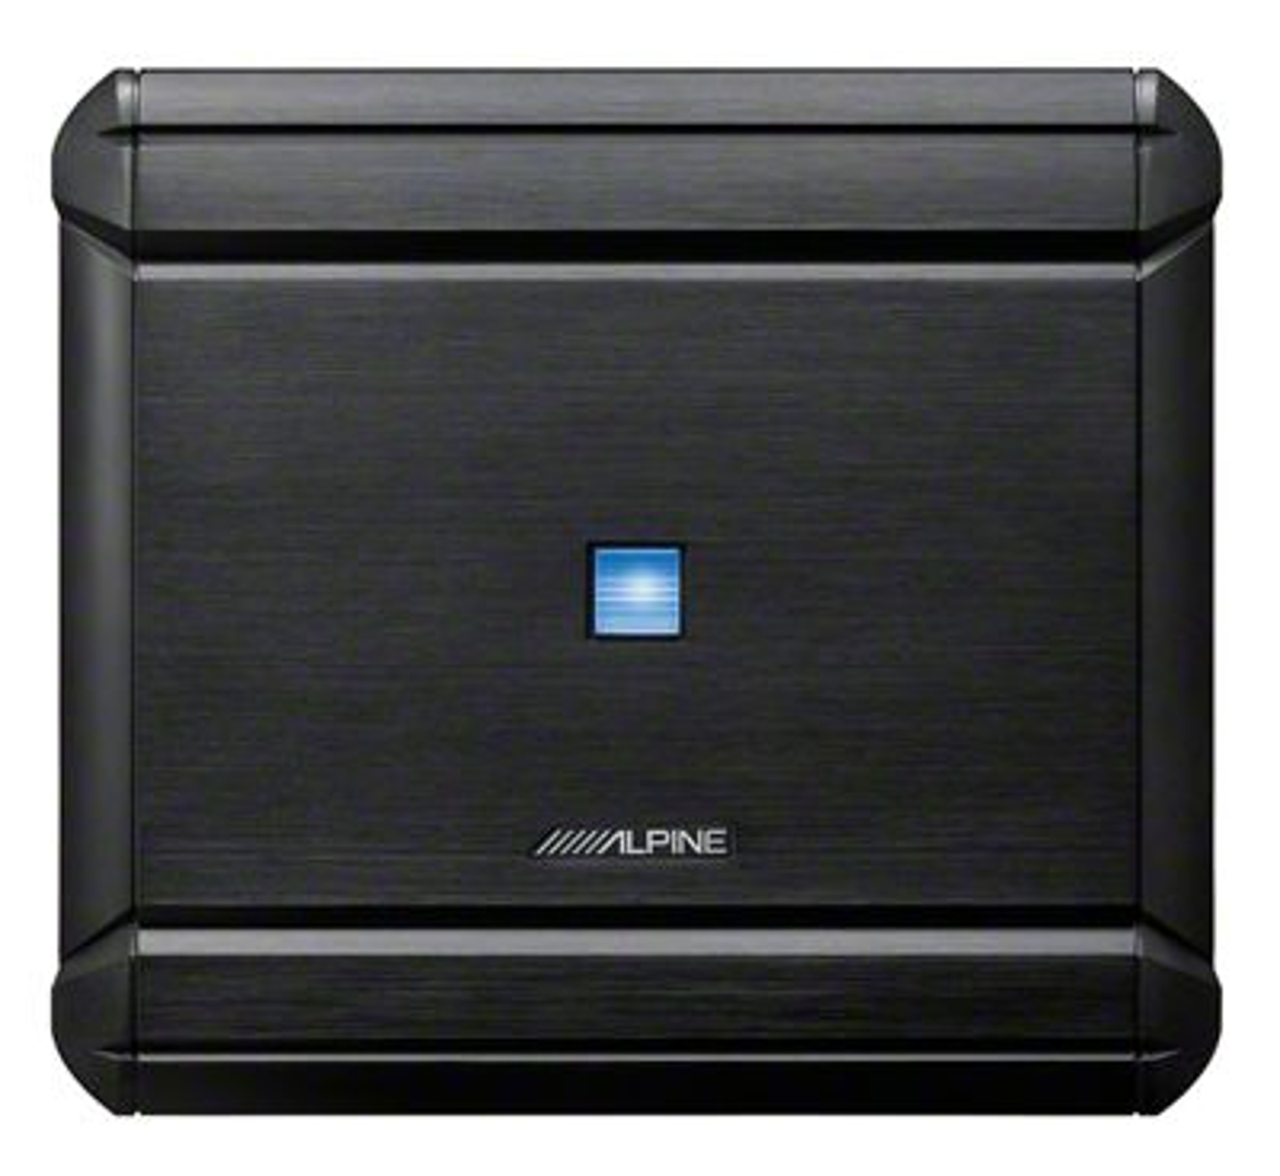 Alpine 5 Channel V-Power Digital Amplifier - 40w x 4 + 150w x 1 (87-19 Jeep Wrangler YJ, TJ, JK & JL)